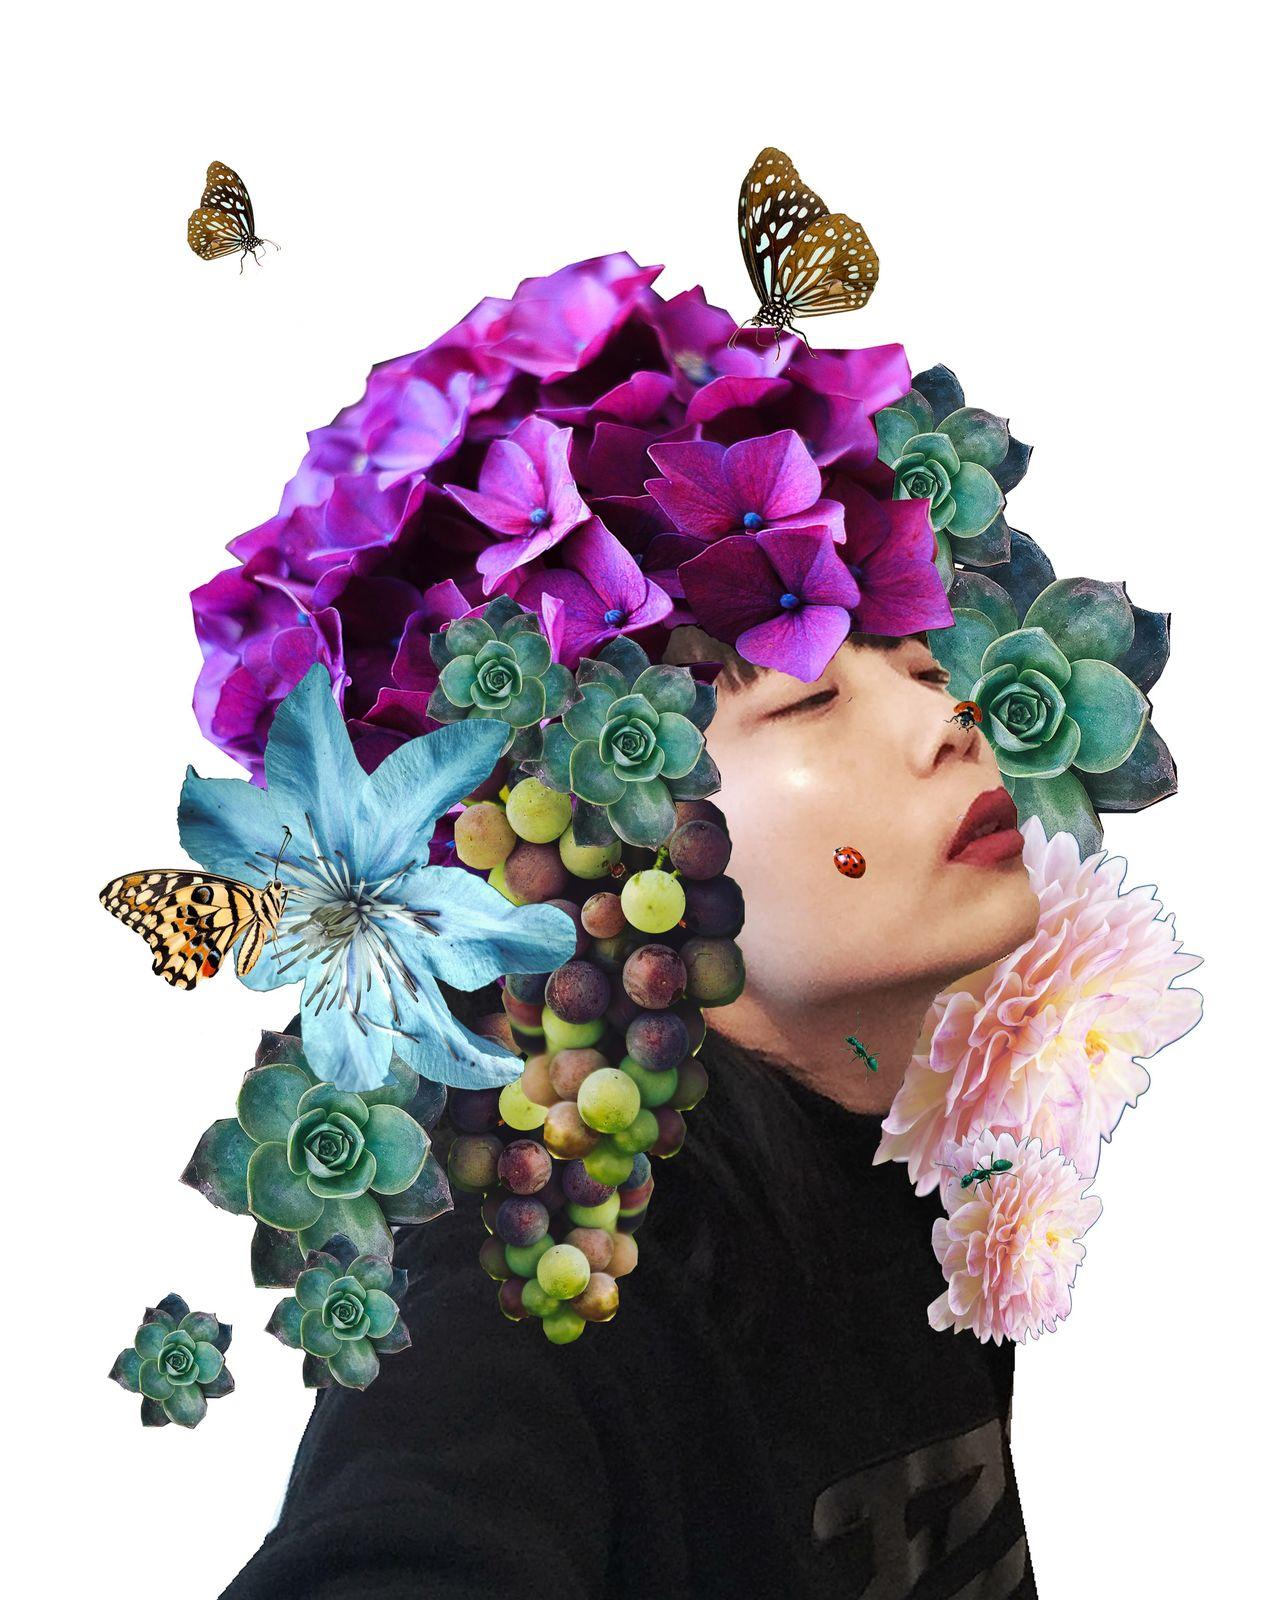 Japan flower girl collageart Collage